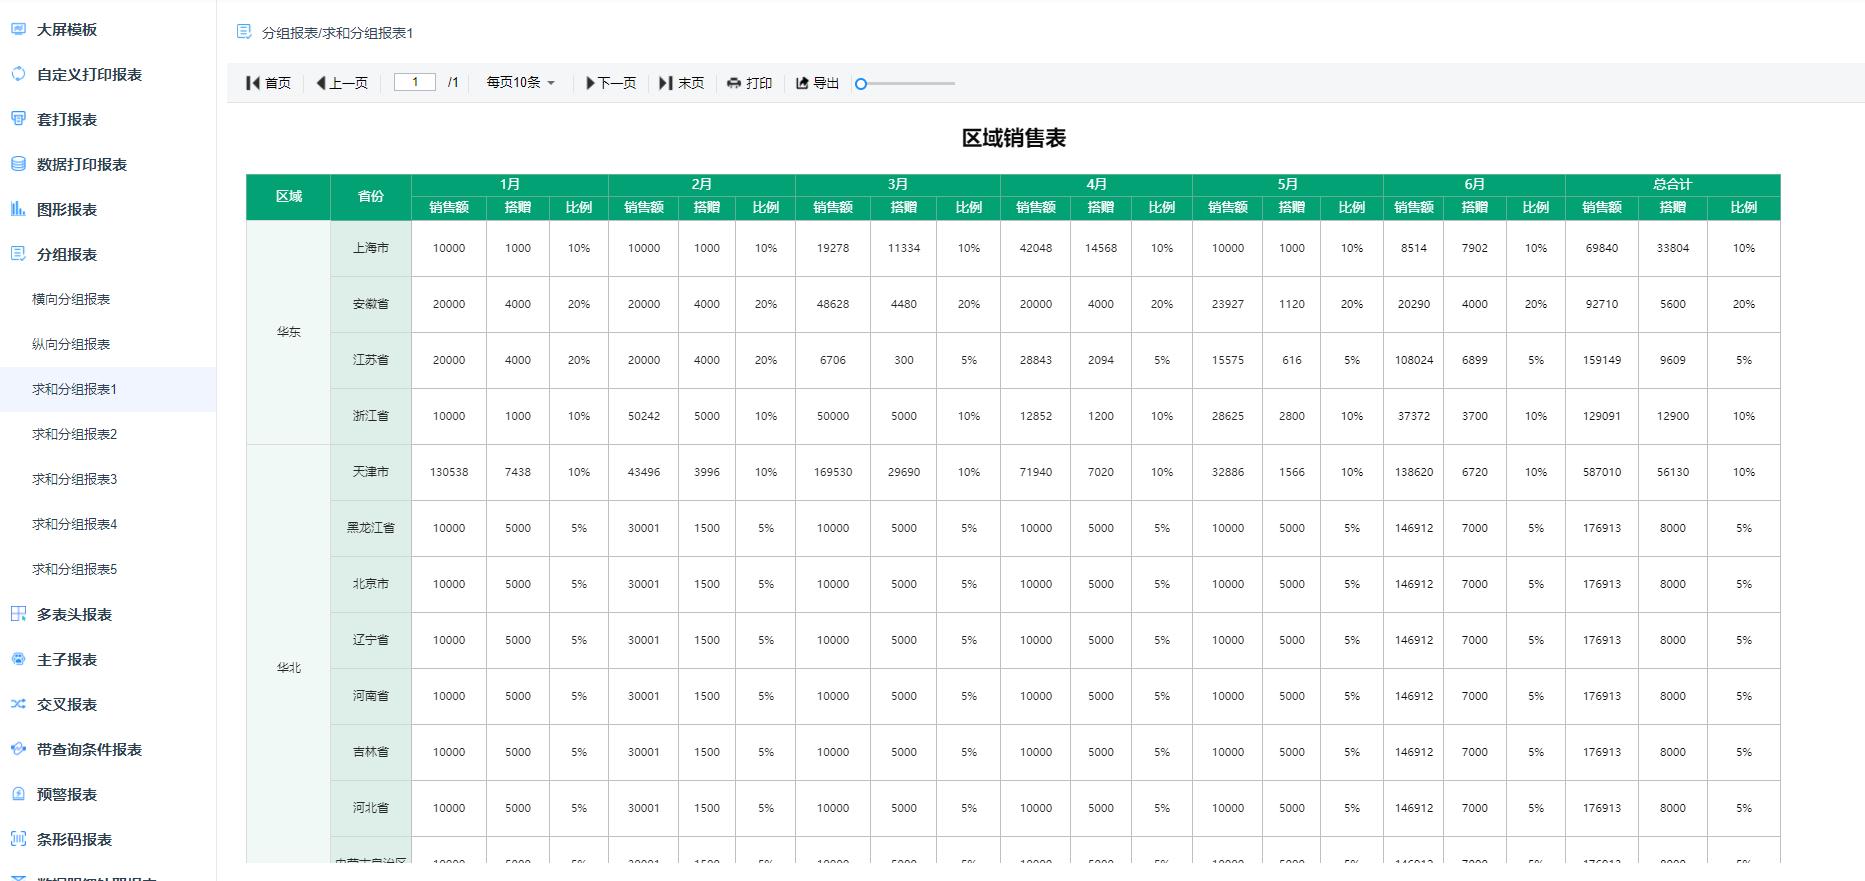 JimuReport积木报表1.3.4 版本发布,可视化报表工具(图5)